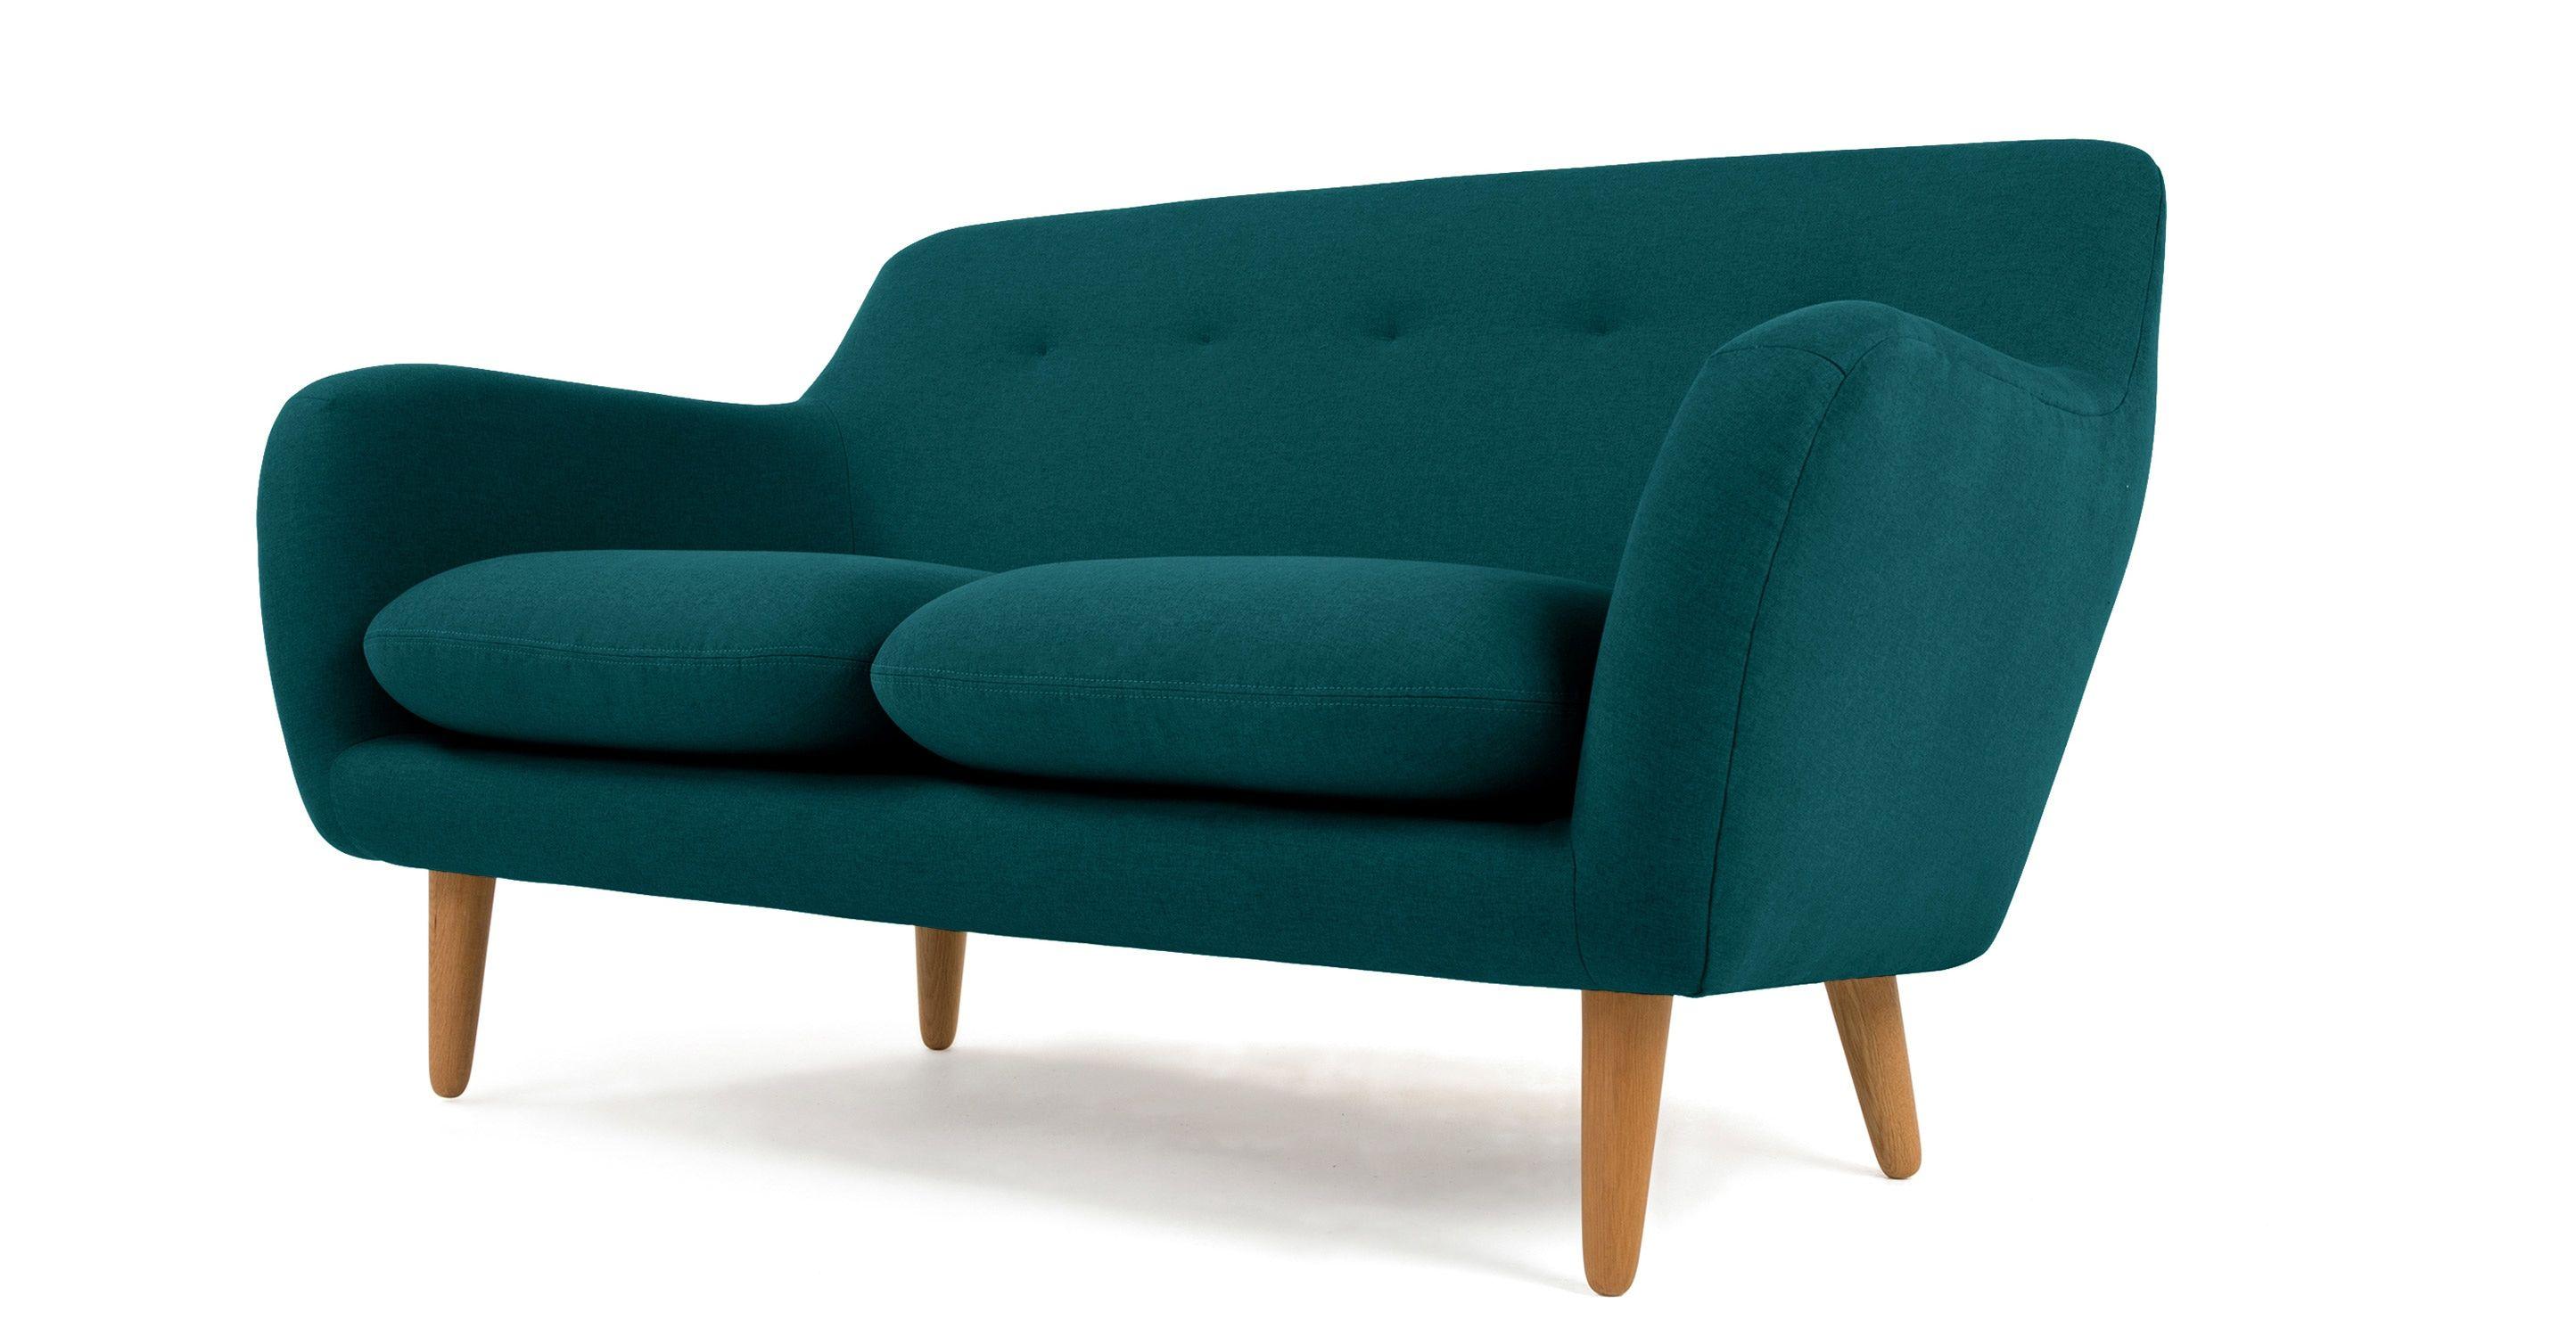 Jonah 2 Seater Sofa in ale brown premium leather